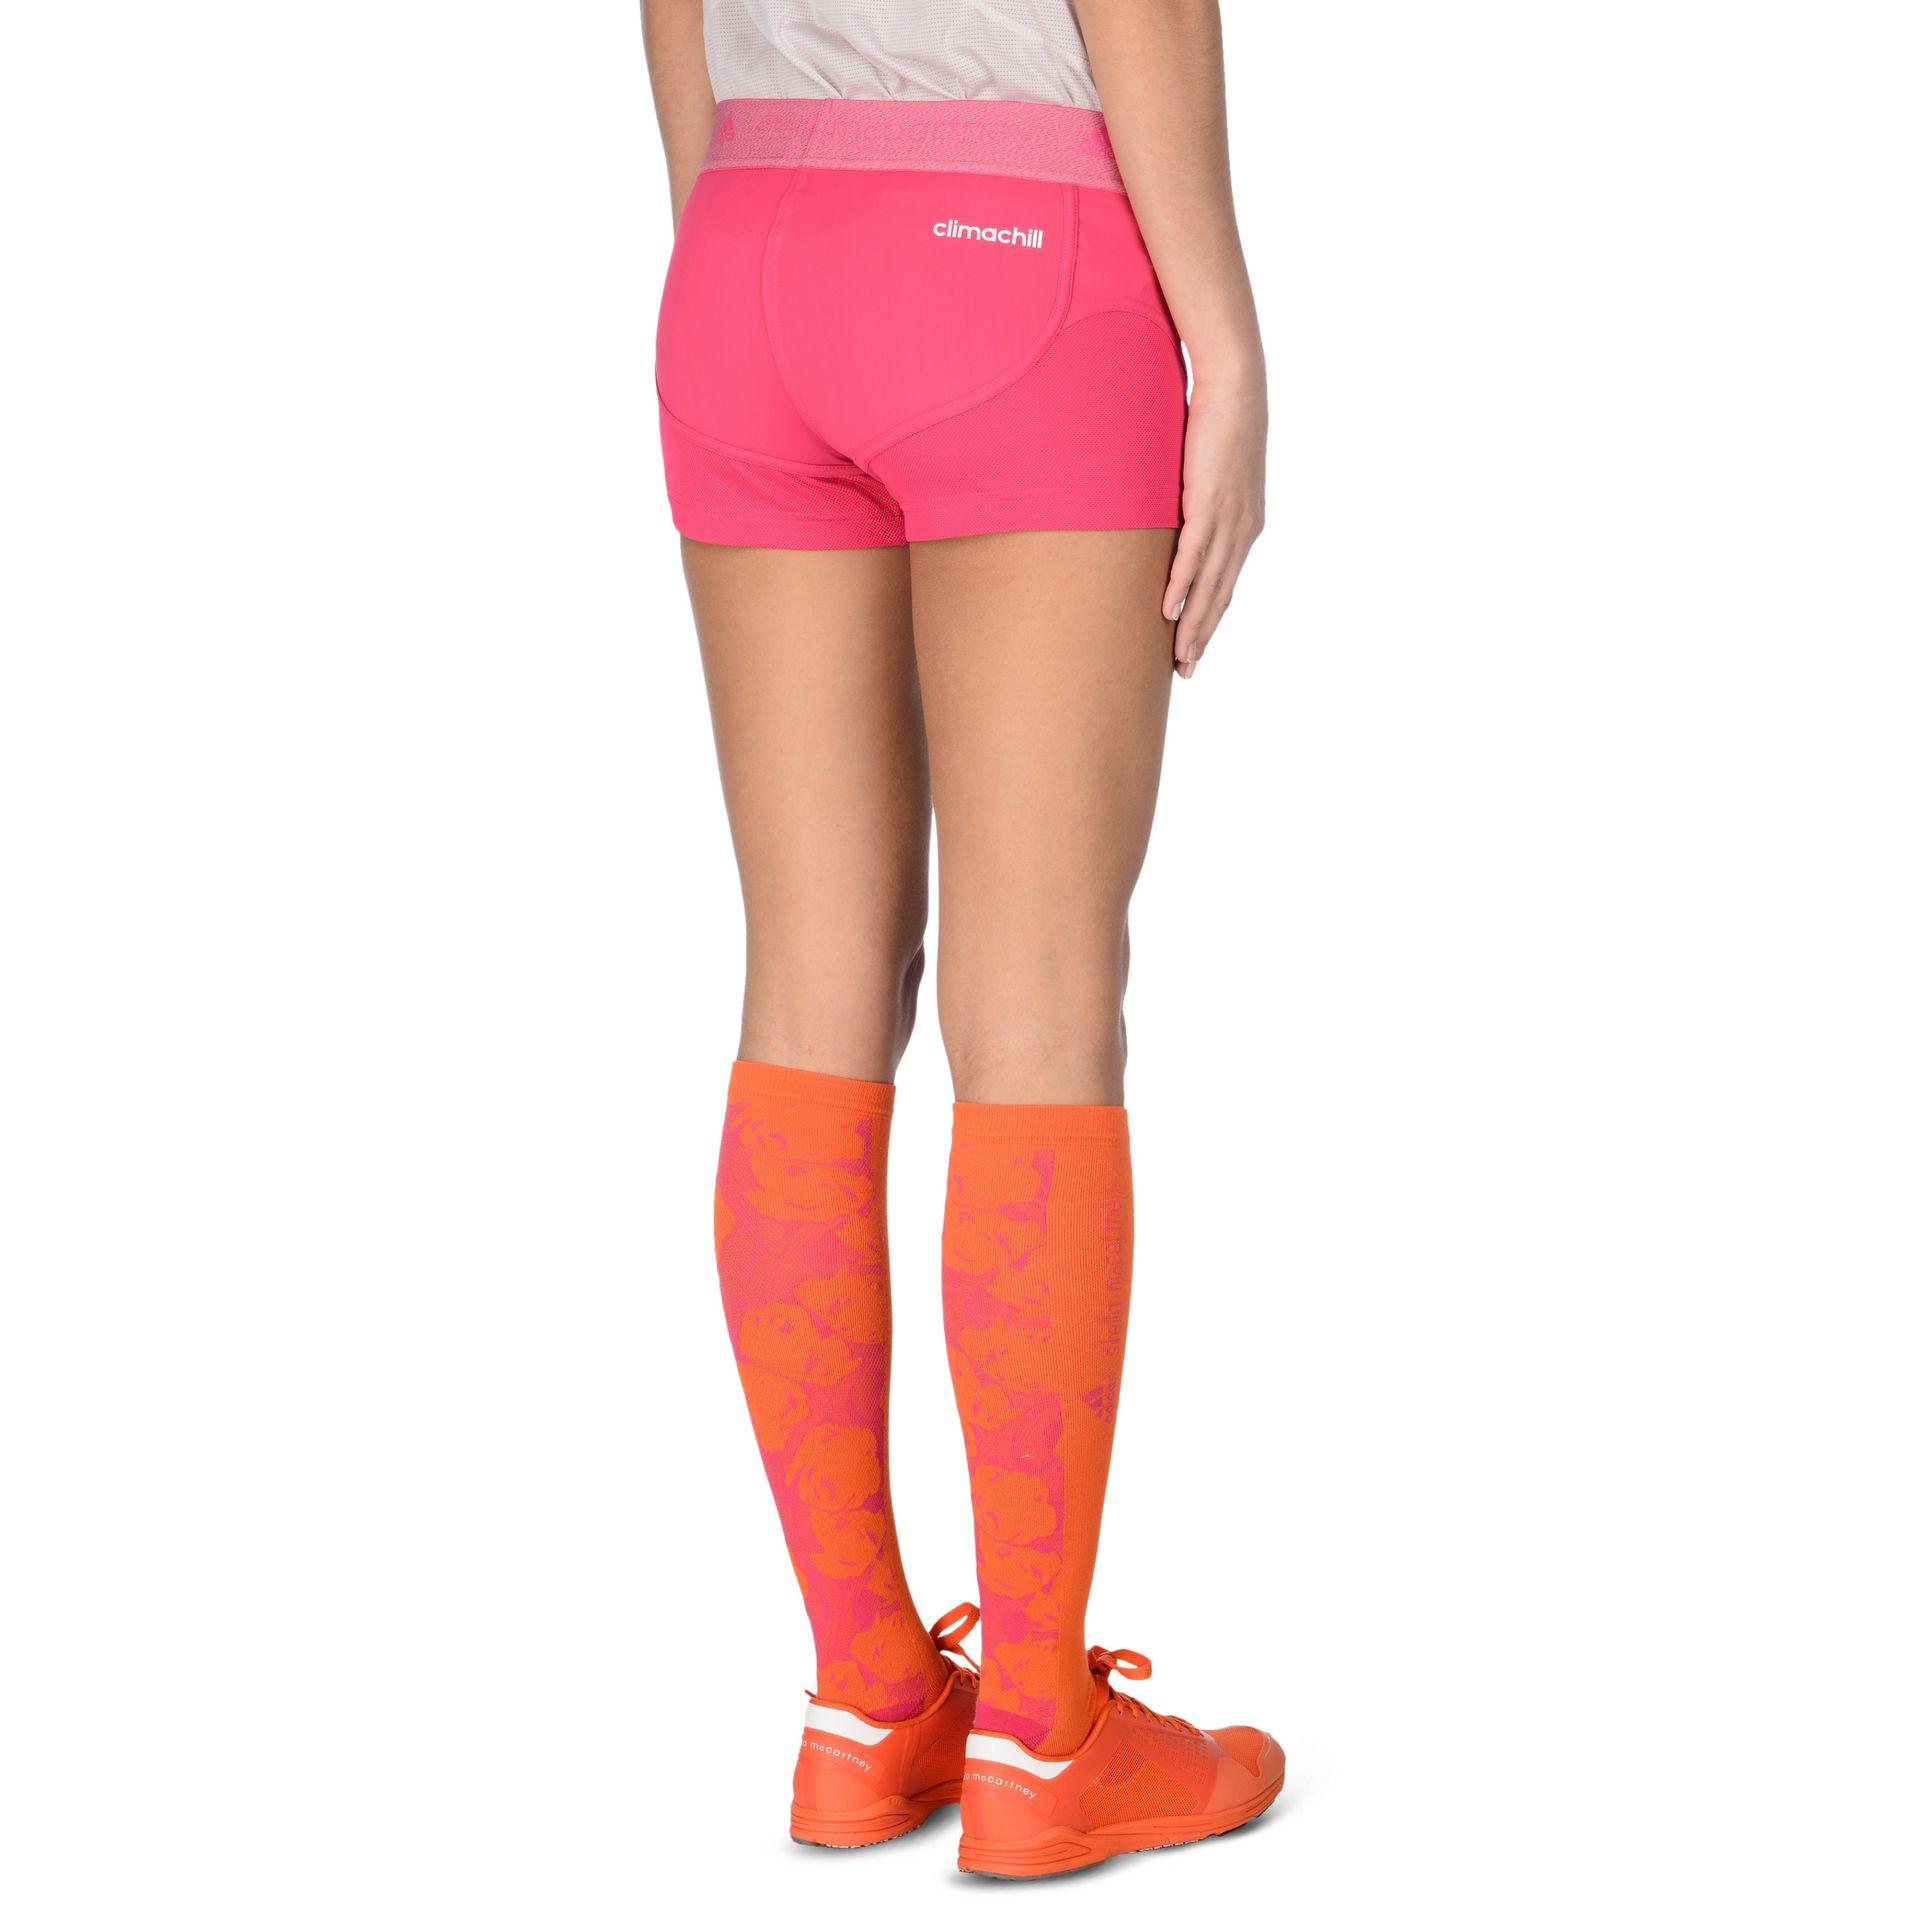 Adidas By By Stella Mccartney Pantalones 13000 cortos Pink Run Clima Chill Run en Pink Lyst dc3530a - rspr.host